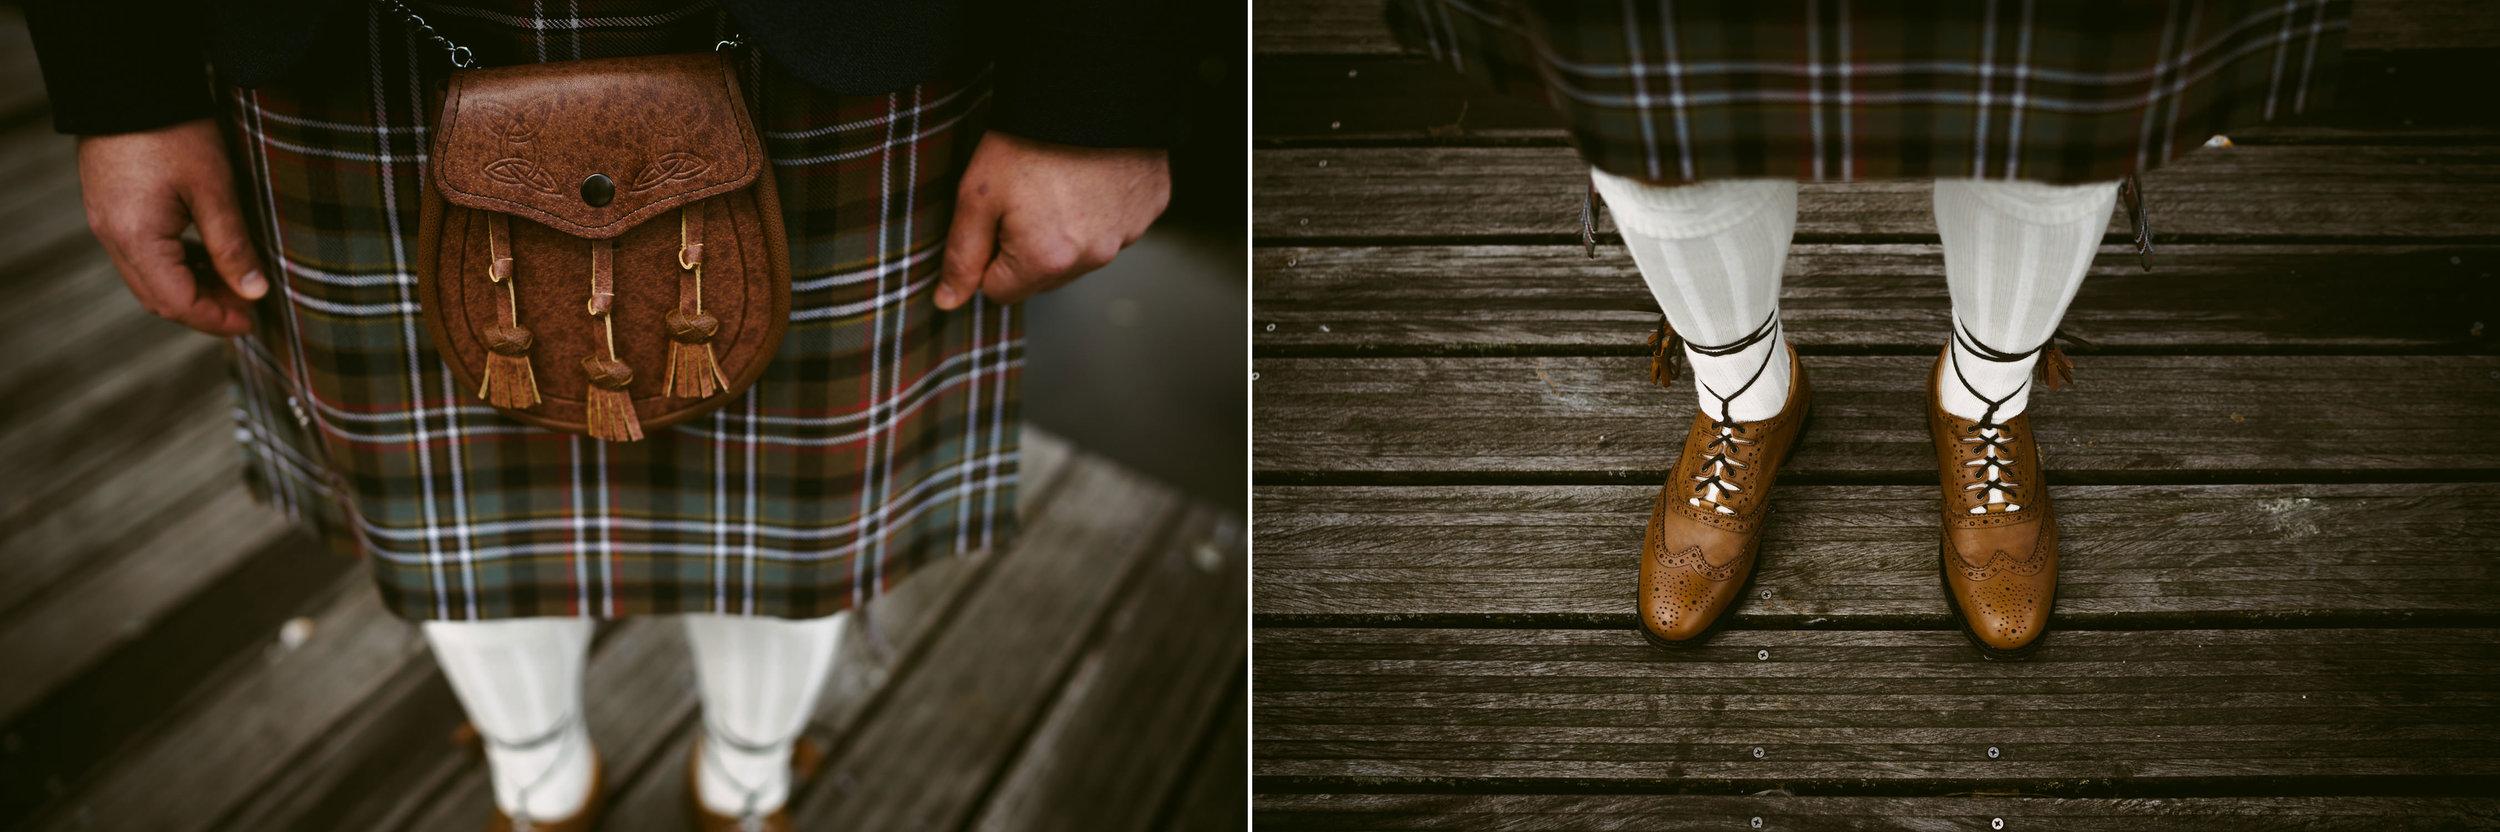 bruidsfotografie amsterdam trouwjurk trouwfotograaf mark hadden